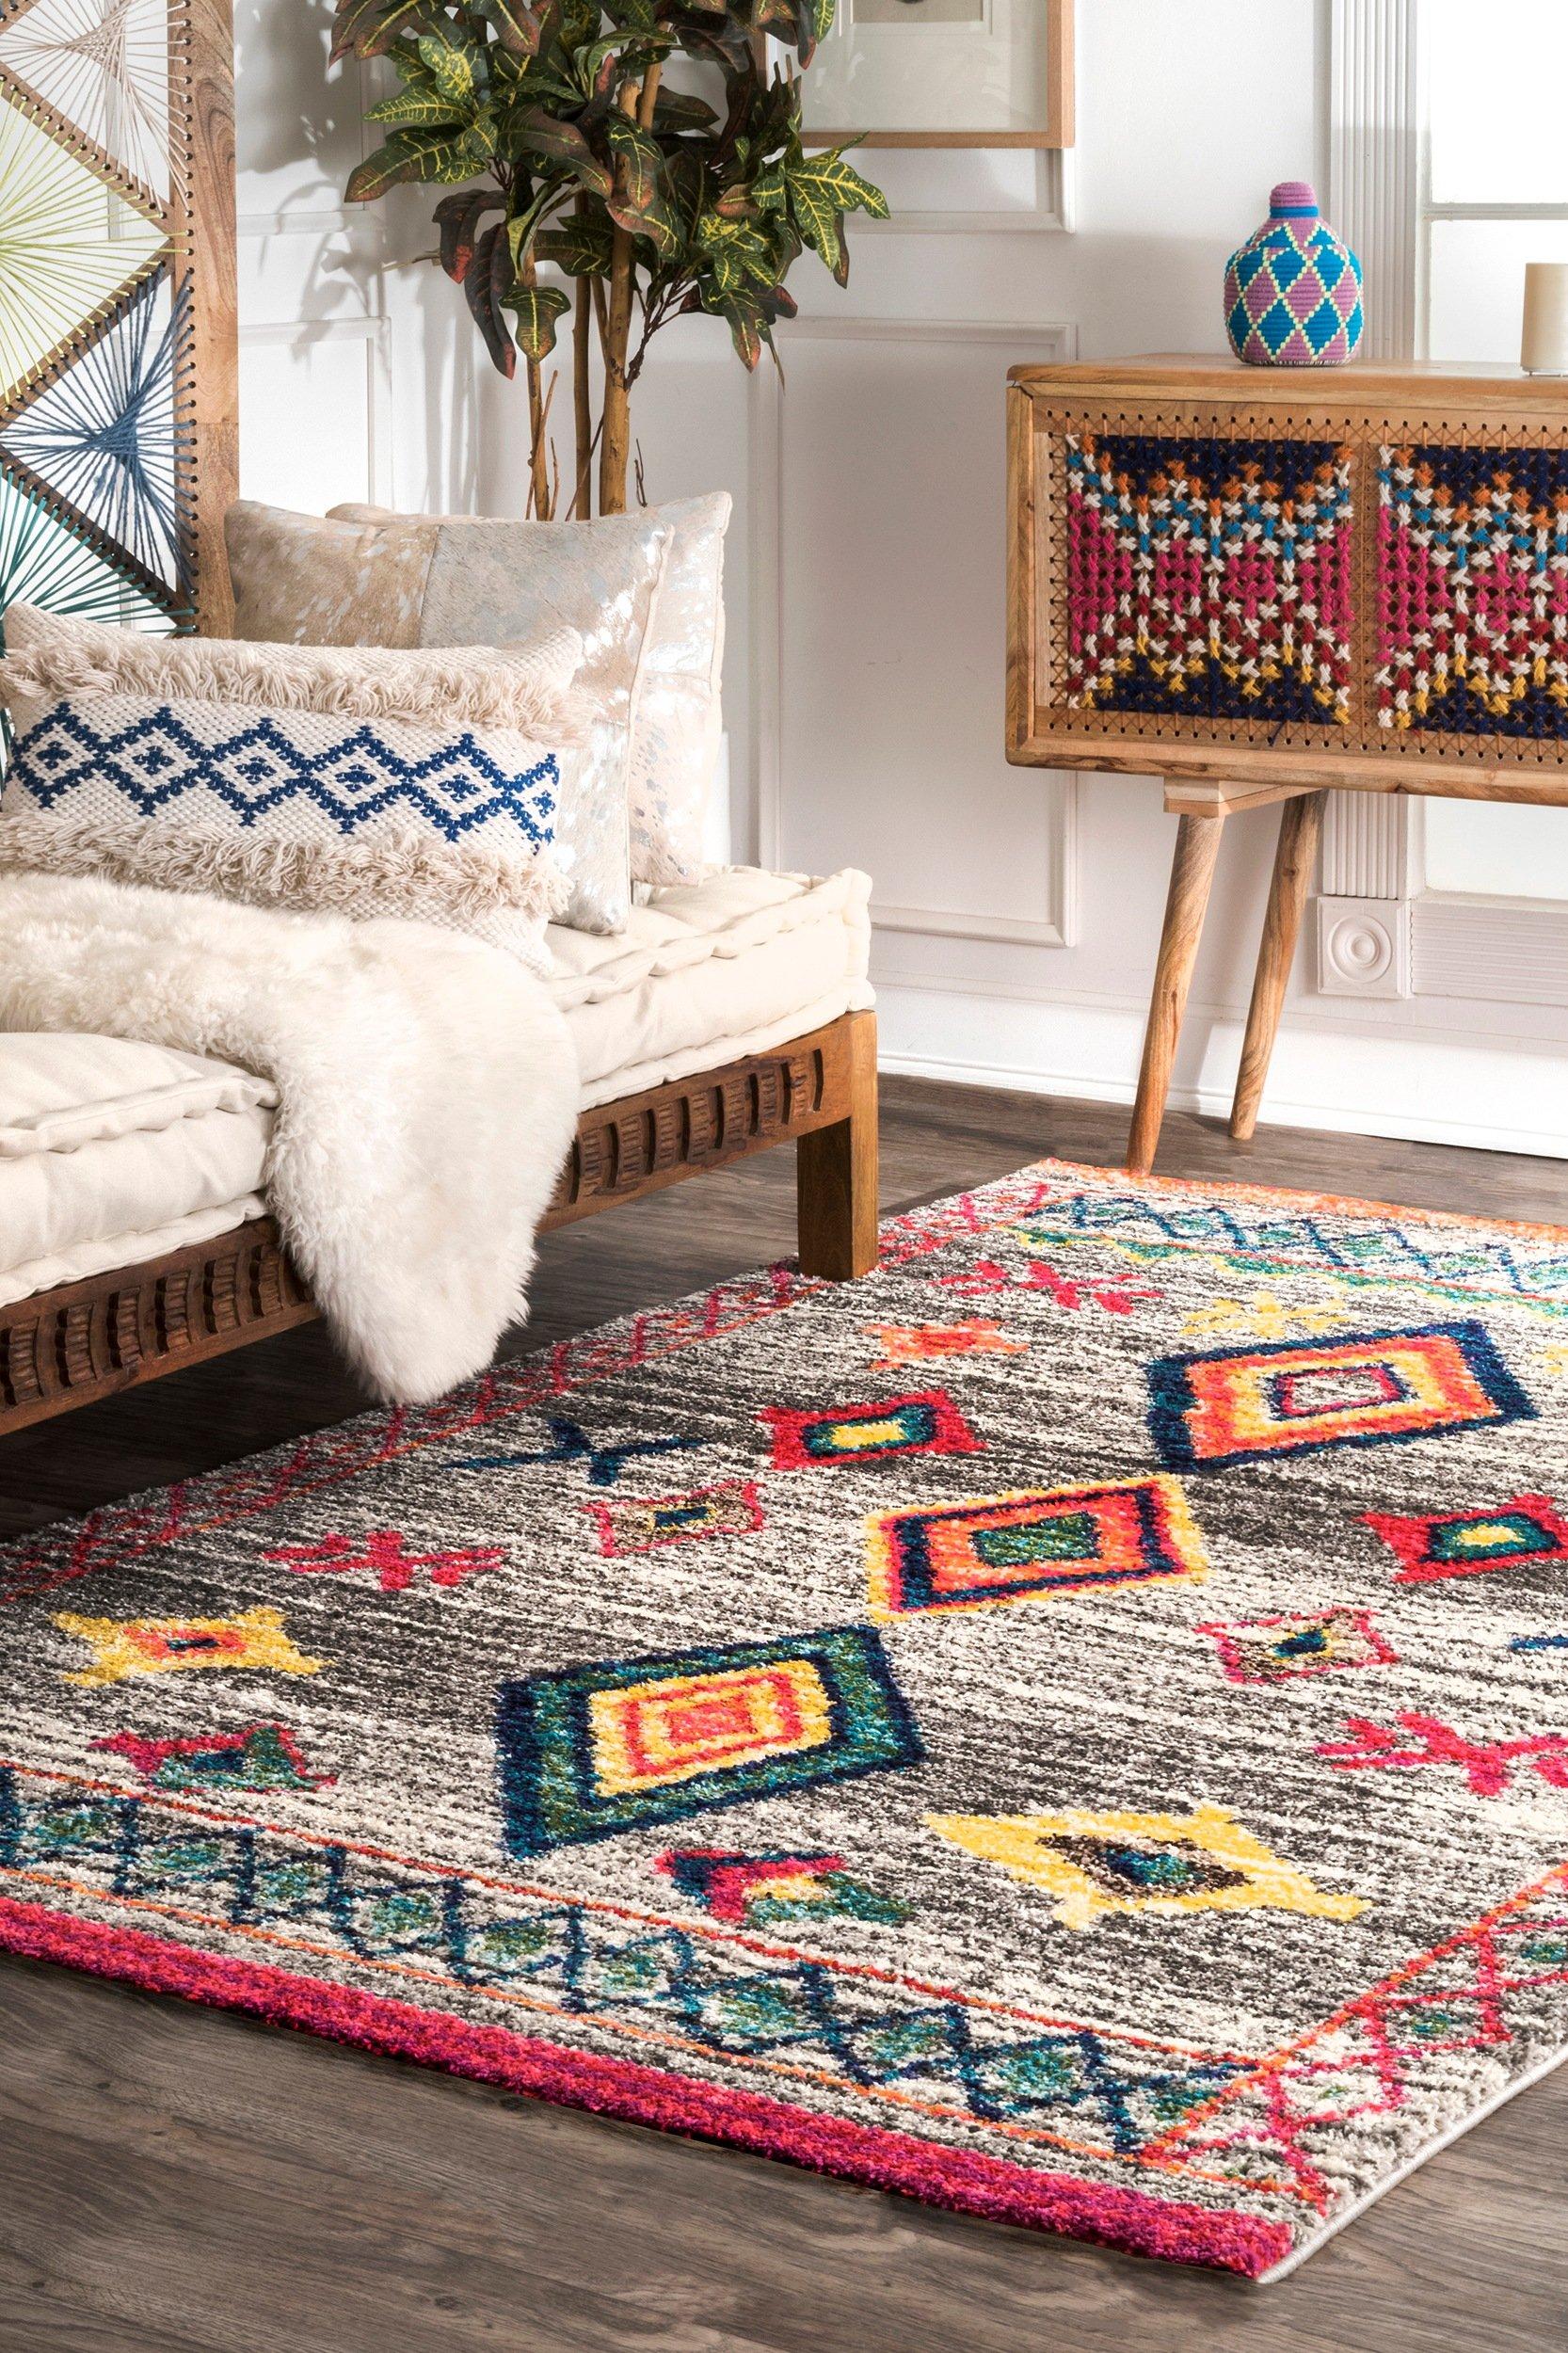 "nuLOOM Nizhoni Tribal Shag Rug, 6' 7"" x 9', Dark Grey - Material: 100% polypropylene Weave: machine made Made in Turkey - living-room-soft-furnishings, living-room, area-rugs - A1meyY1JnpL -"